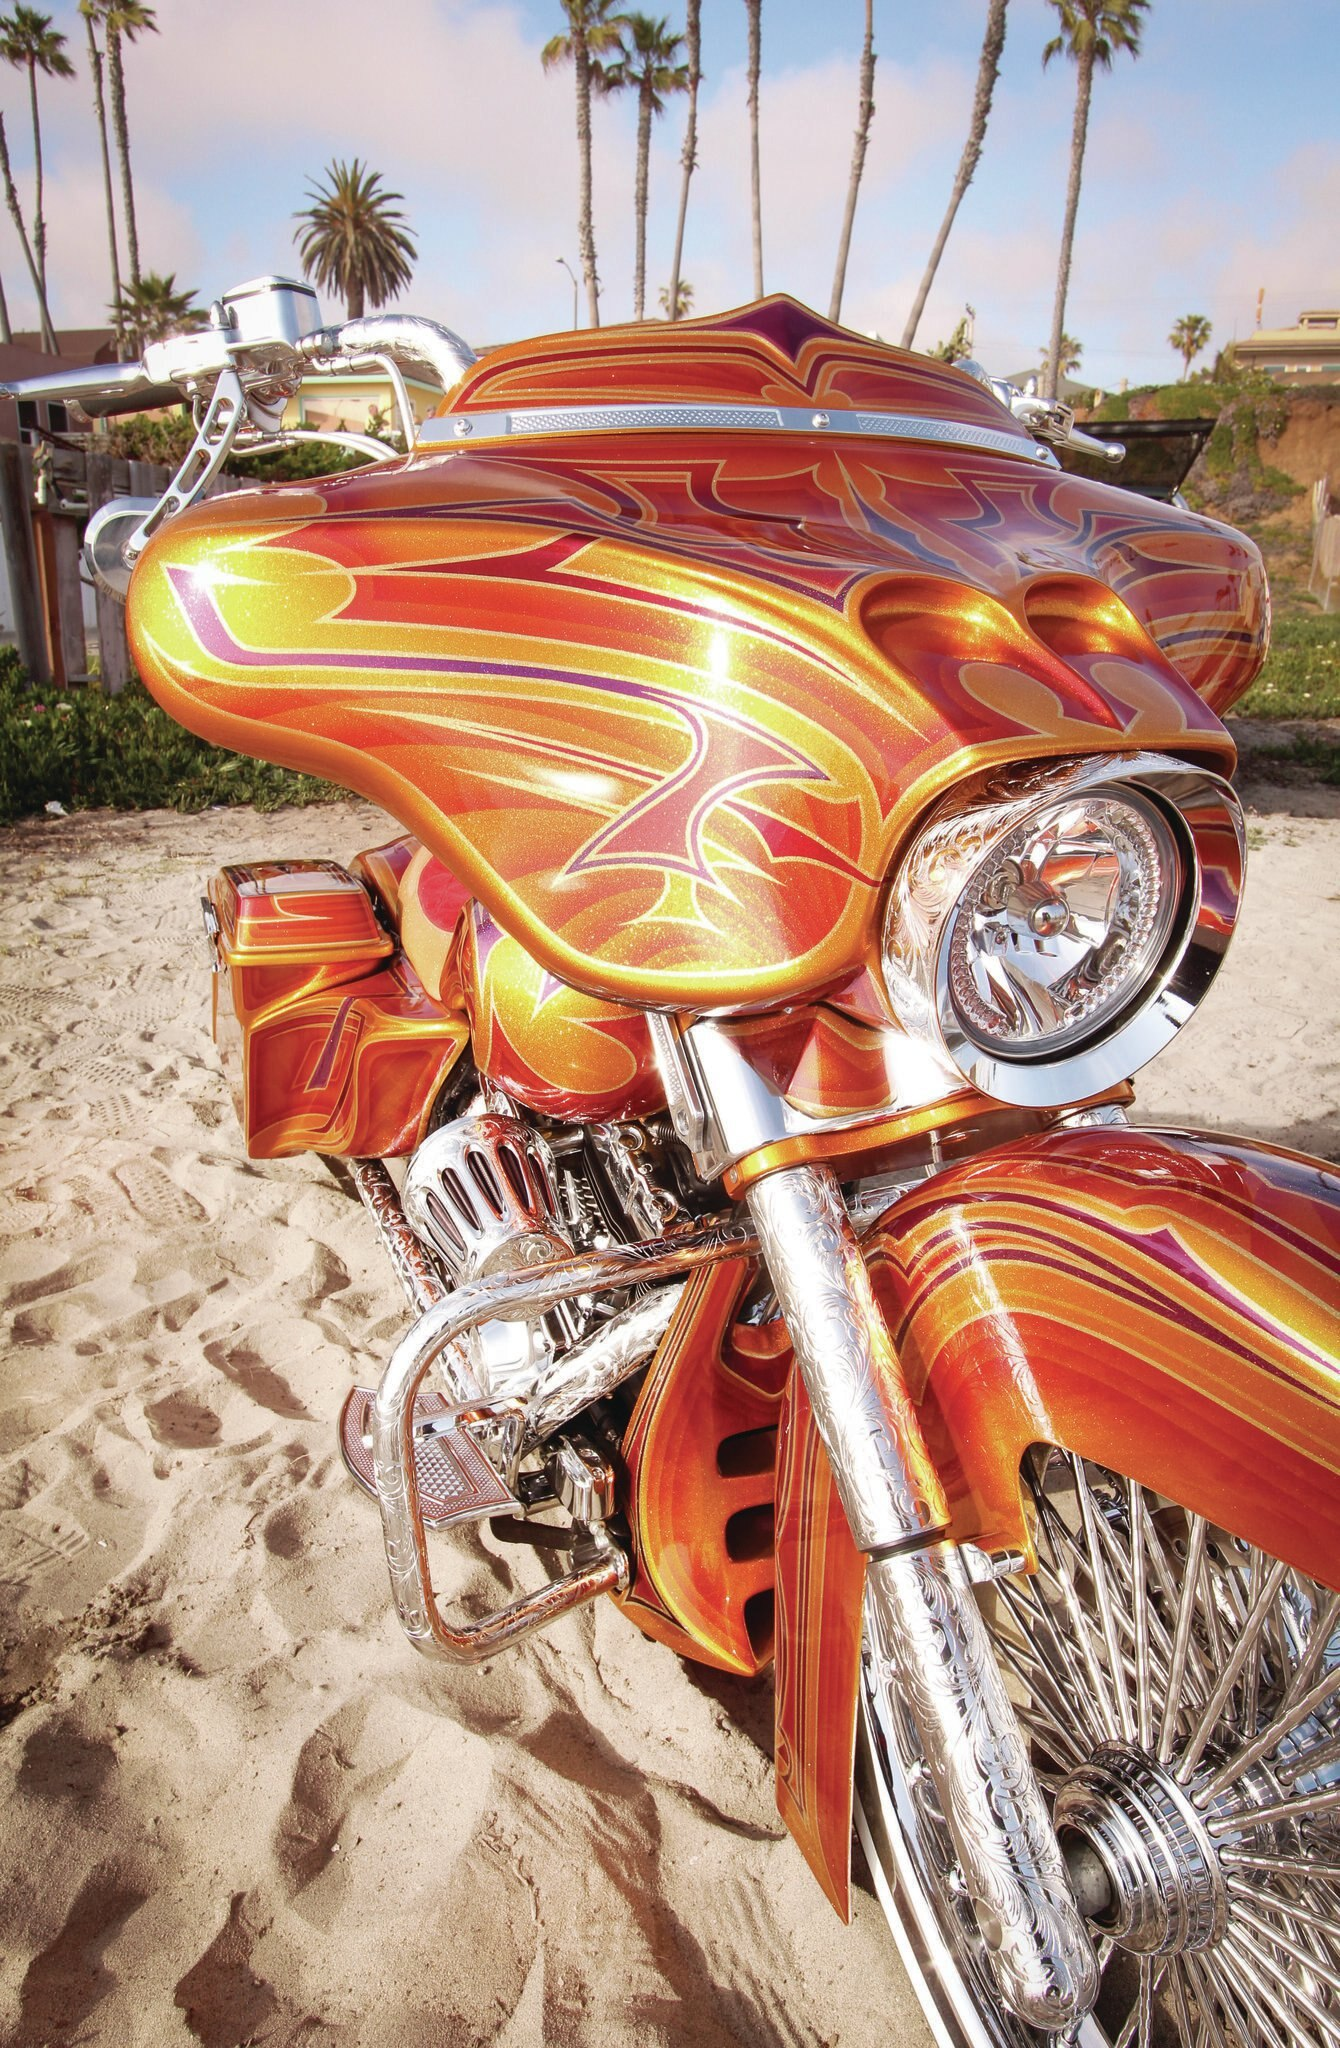 2006 Harley Davidson Street Glide Chicano Style